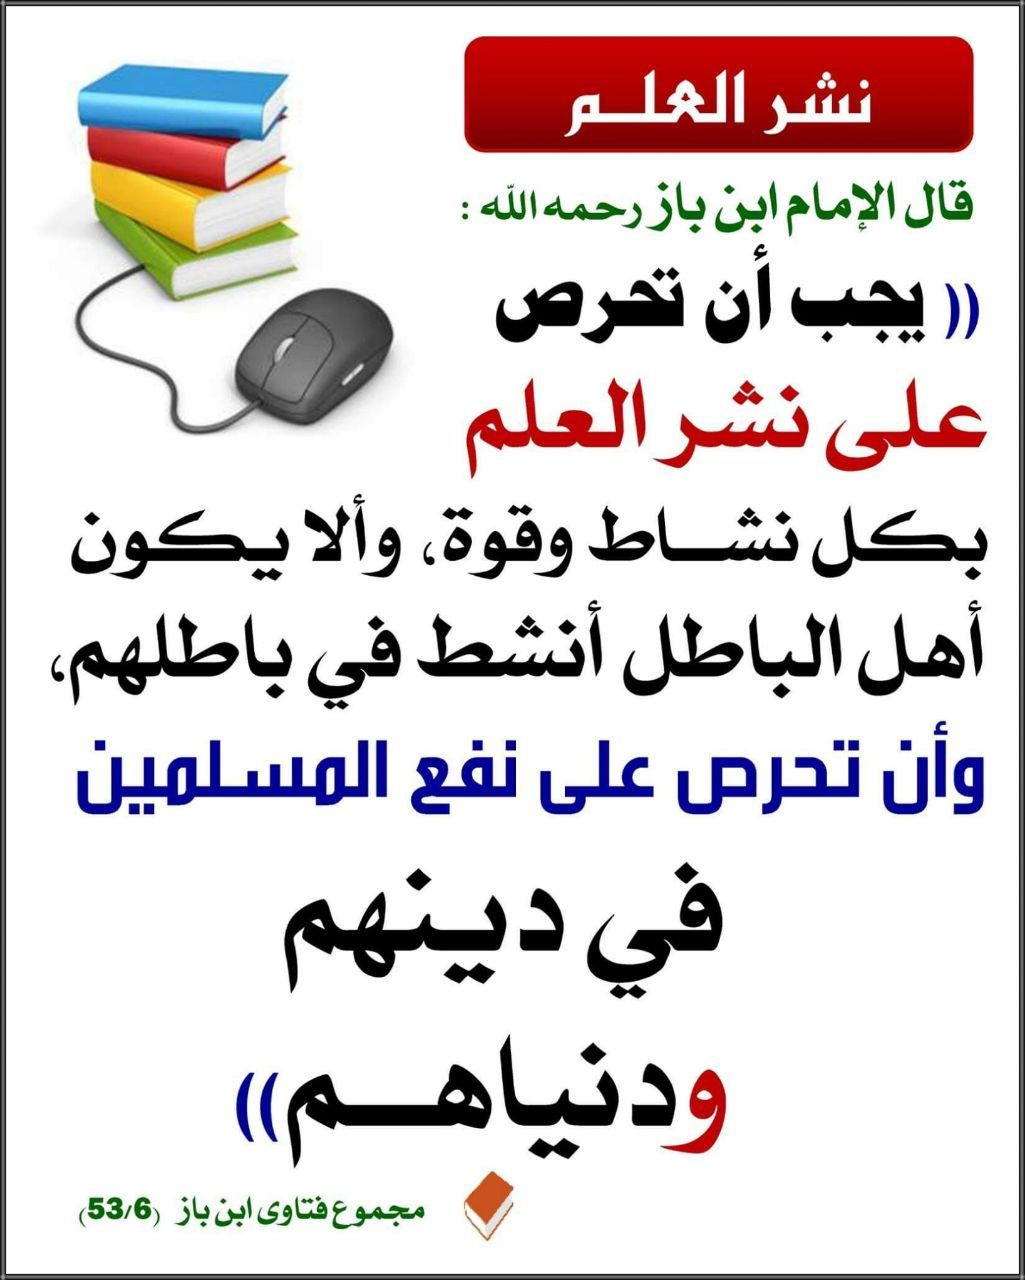 Pin By الأثر الجميل On أقوال الصحابة والعلماء Islamic Quotes Arabic Calligraphy Quotes